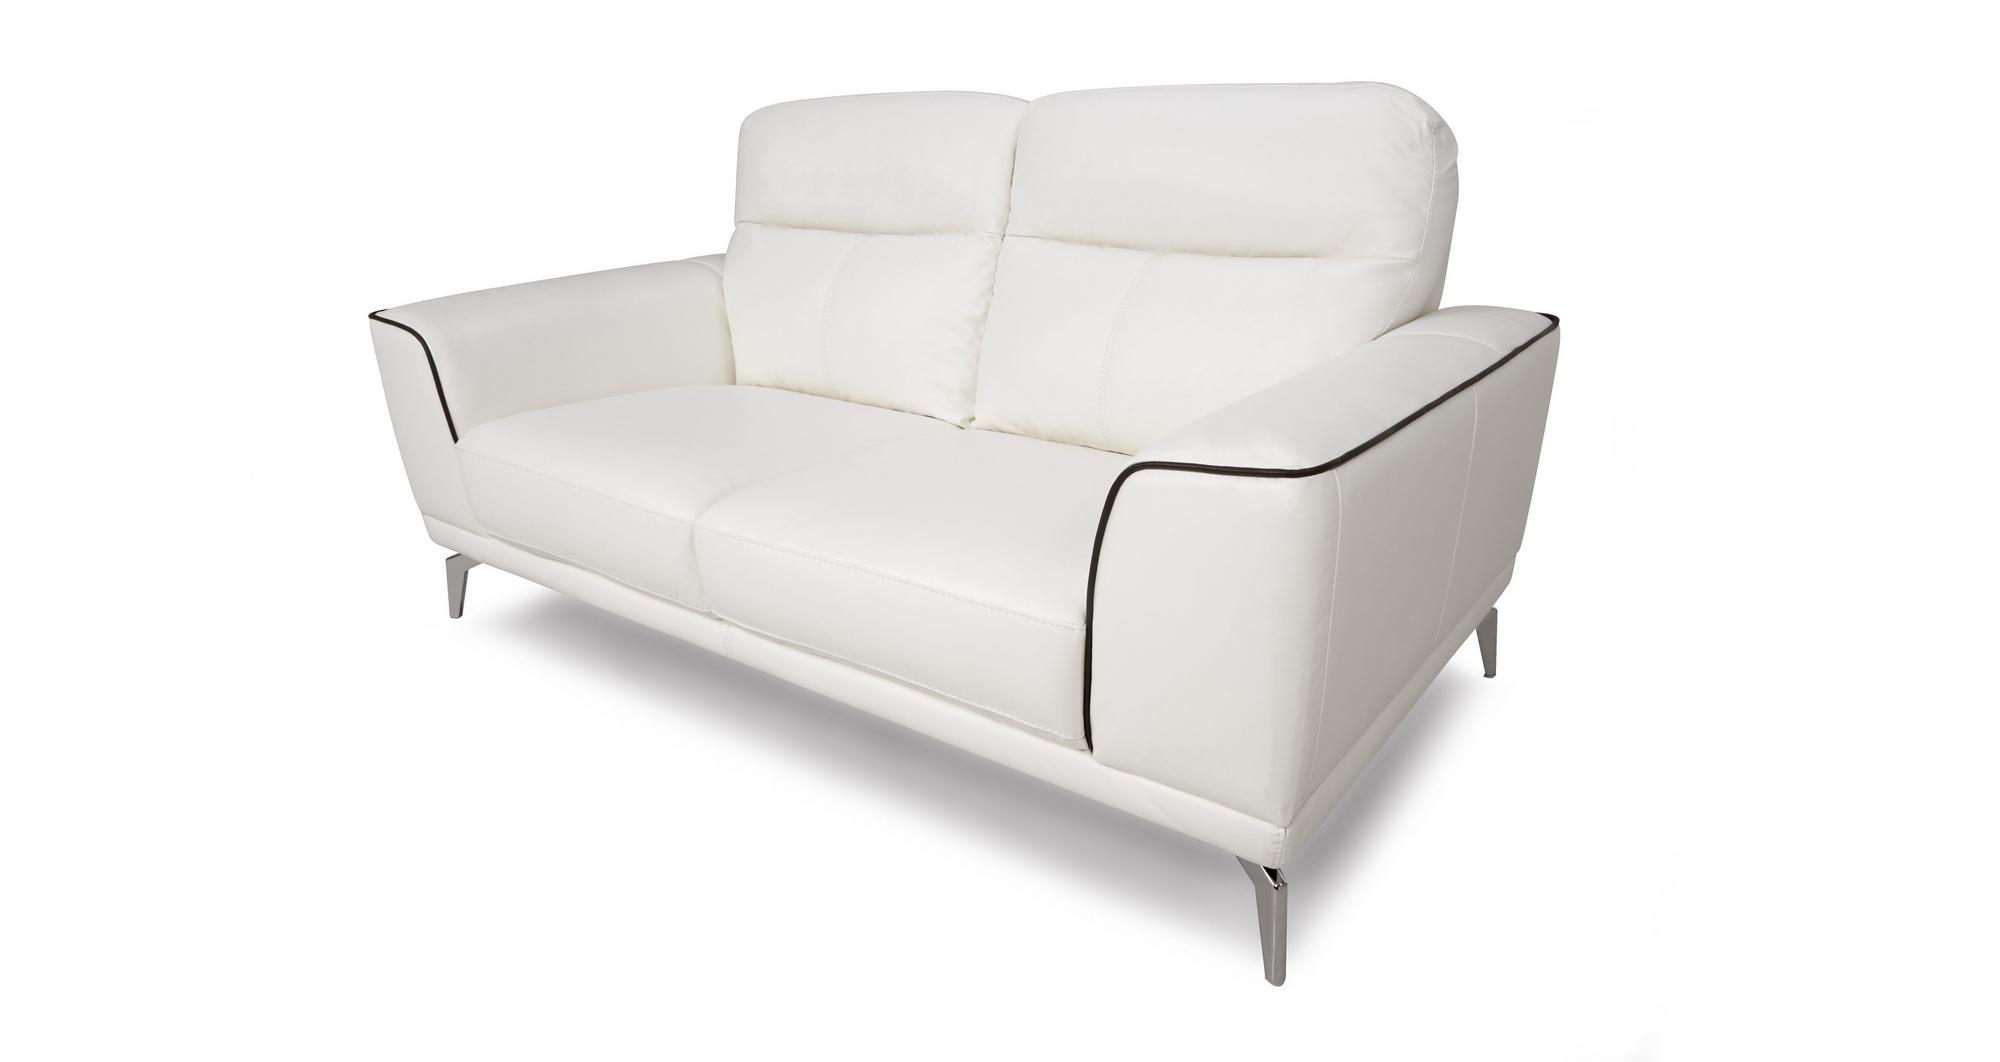 Dfs Denver Snow White Leather 2 Seater Sofa Ebay